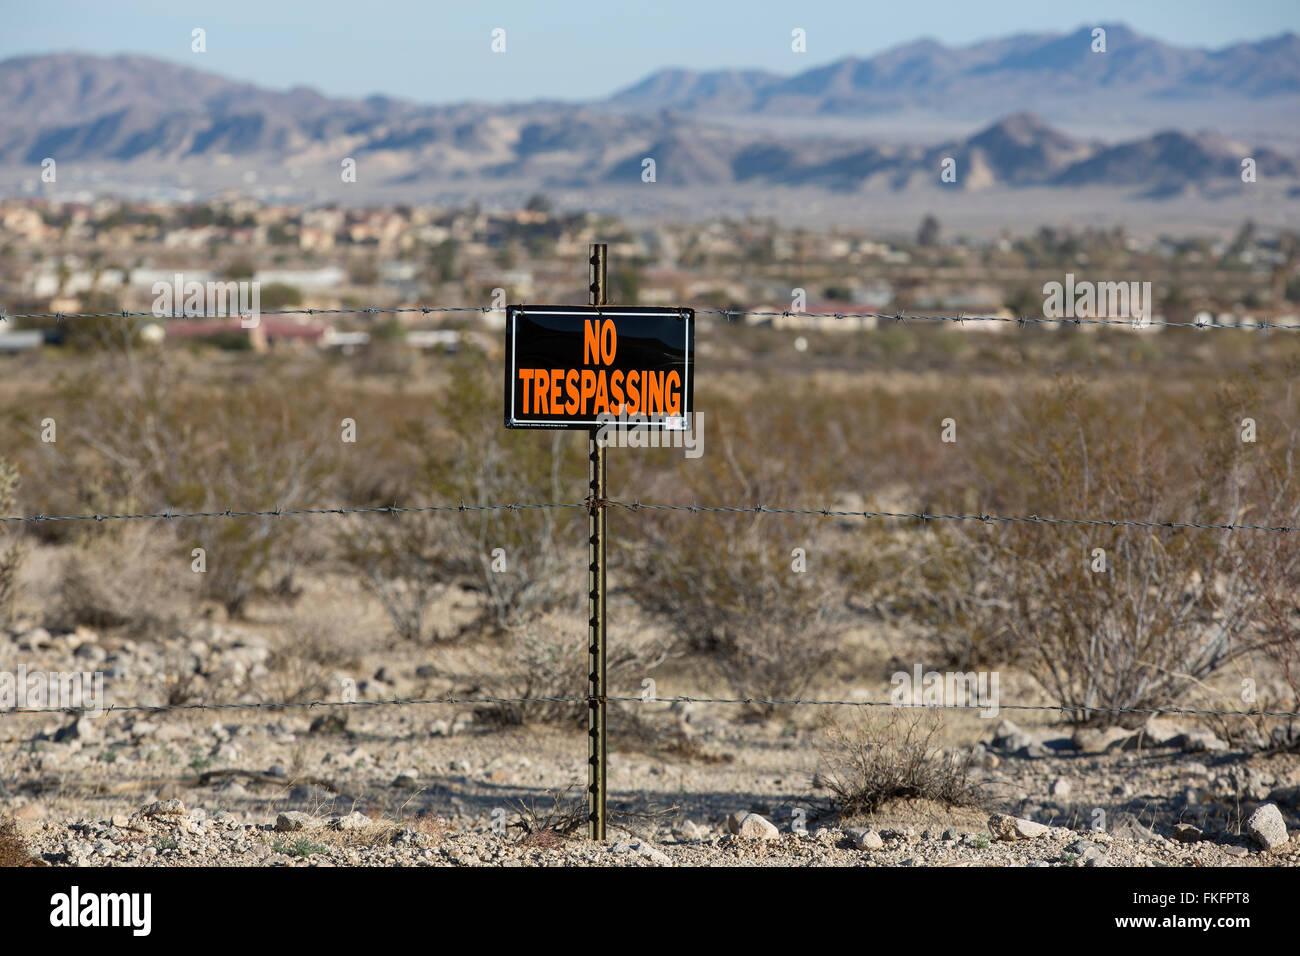 Fenced land, Twentynine Palms, California, USA - Stock Image